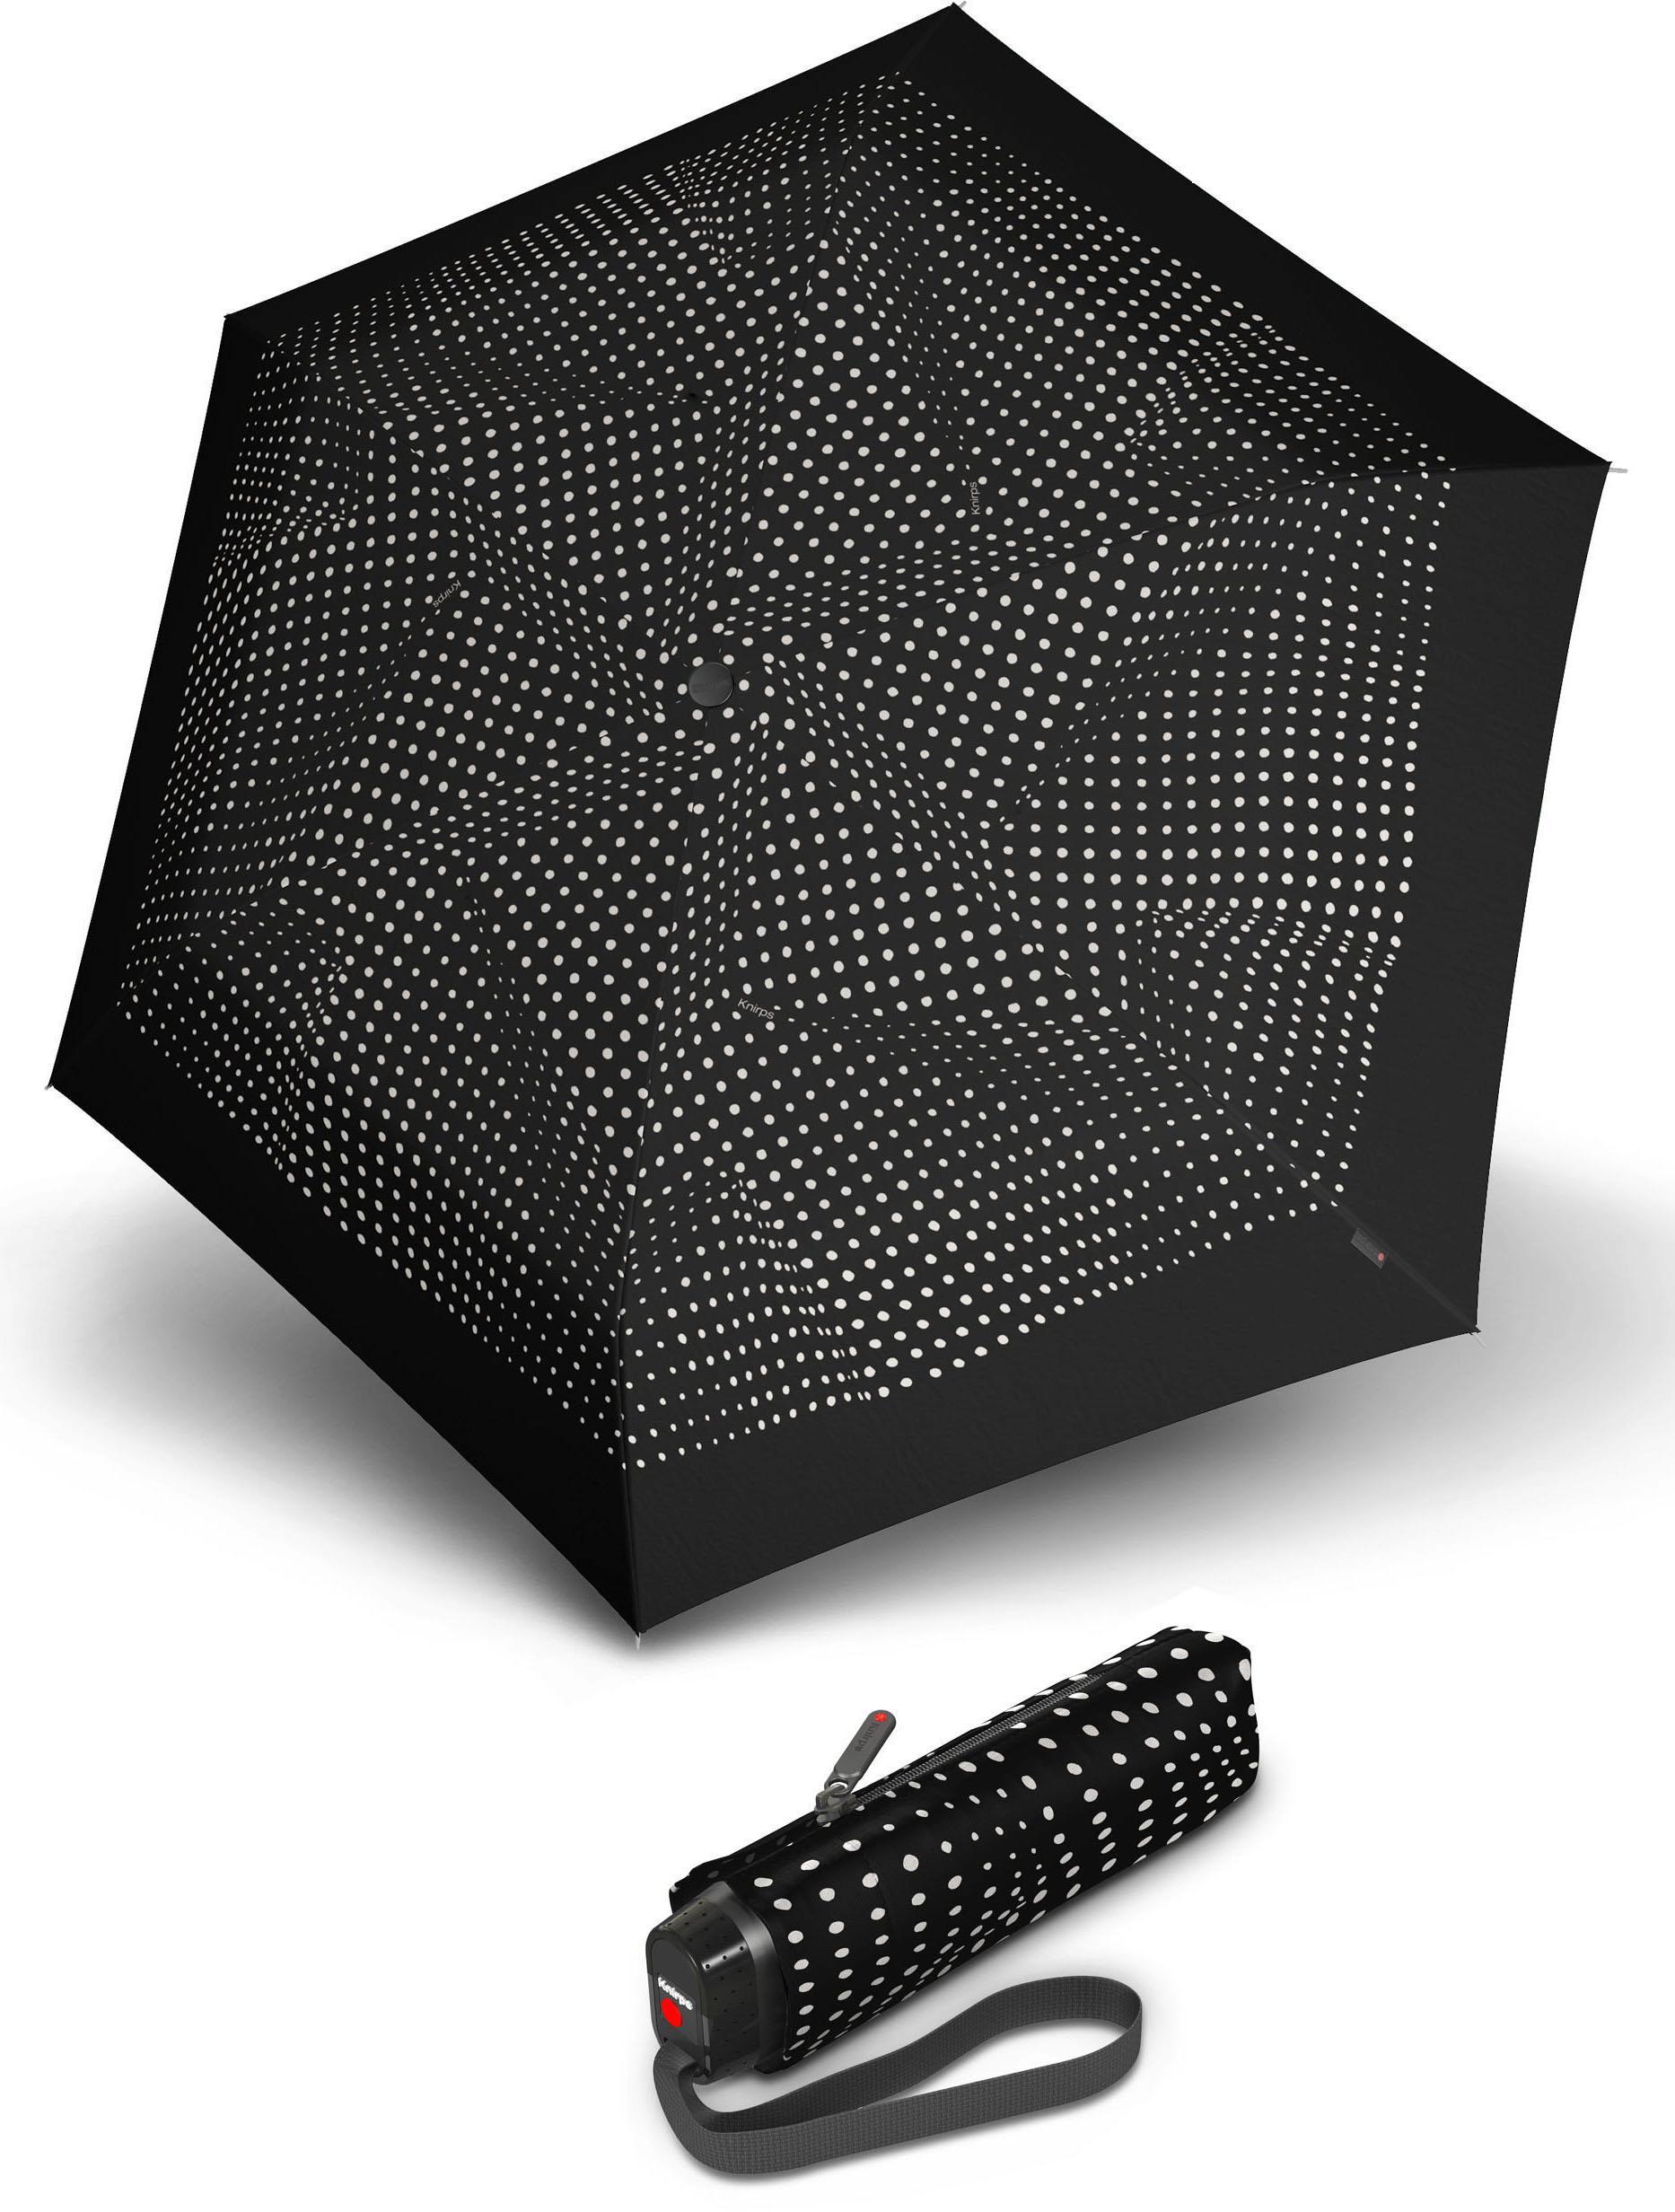 Knirps® Regenschirm - Taschenschirm, »TS.010 Slim Small Manual bolero black/ecru« | Accessoires > Regenschirme > Taschenschirme | Schwarz | KNIRPS